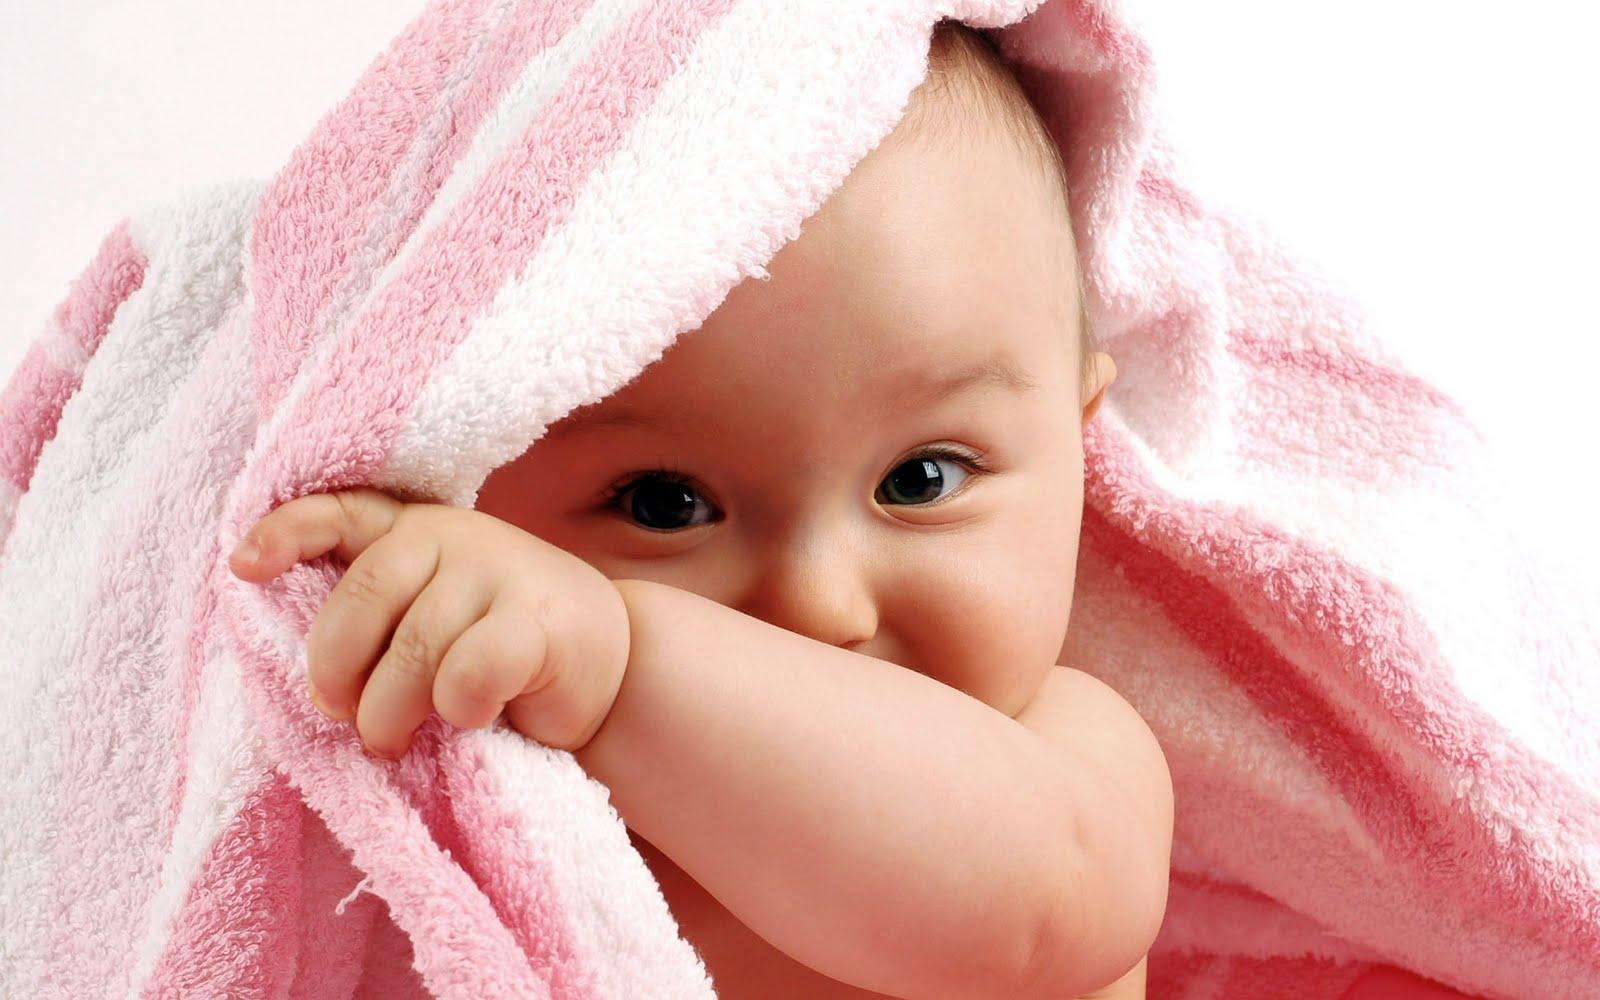 http://4.bp.blogspot.com/-B5UU82DVNro/TkQauGL7CMI/AAAAAAAAIko/al3iub0jWA4/s1600/HD+high+resolution+wallpapers+High-Resolution-4-Baby.jpg